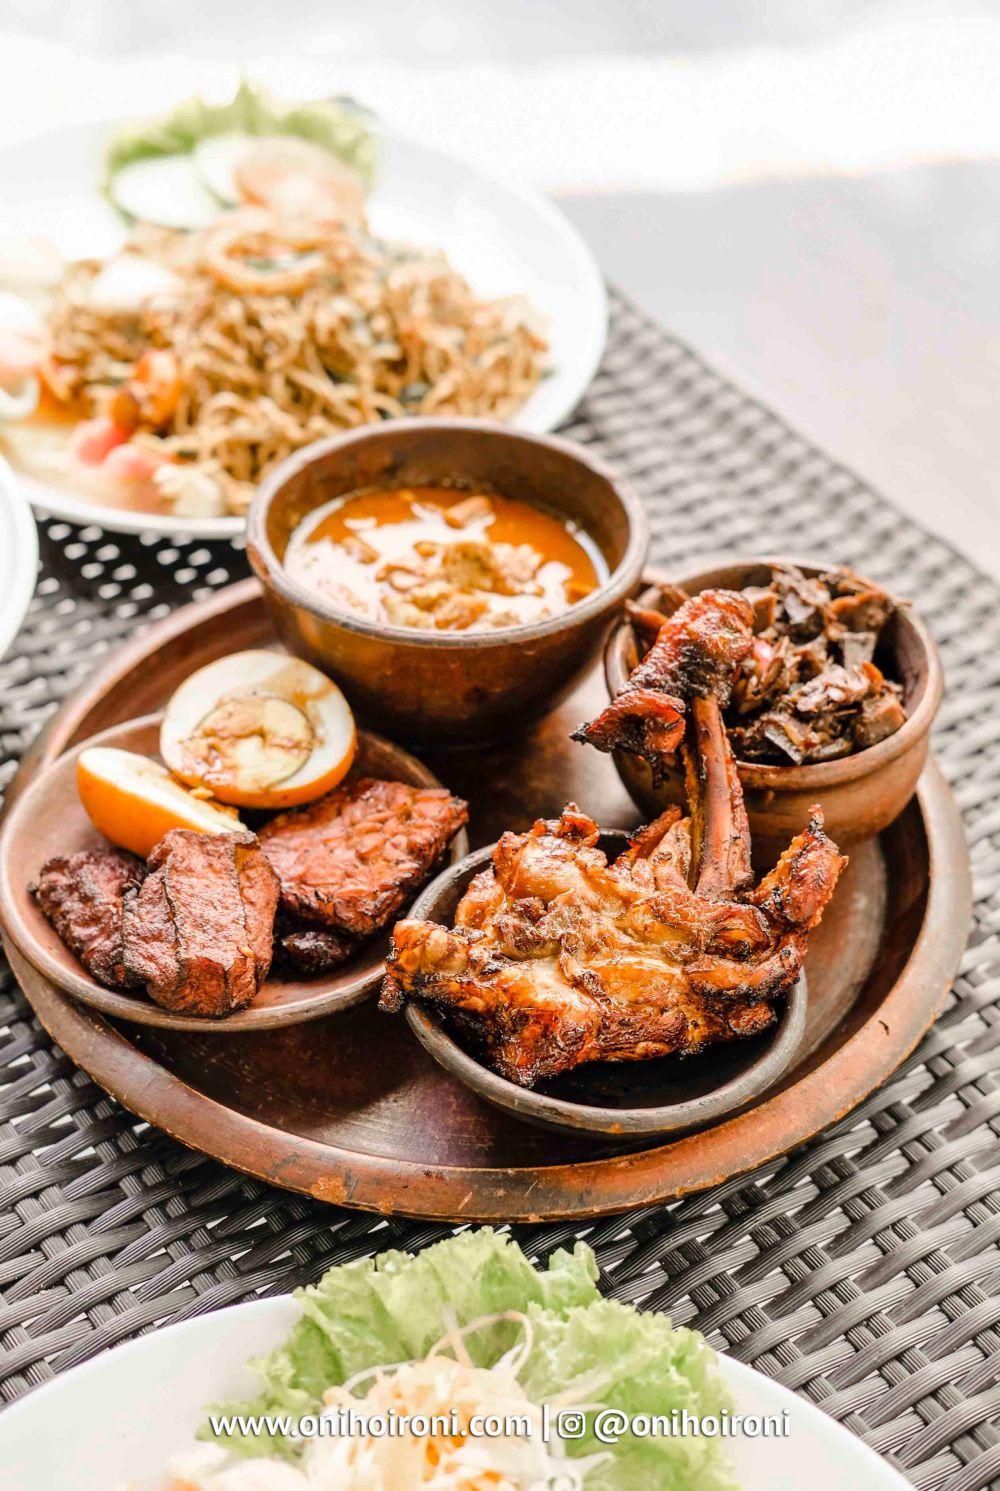 Food Grand Tjokro Yogyakarta 2.jpg